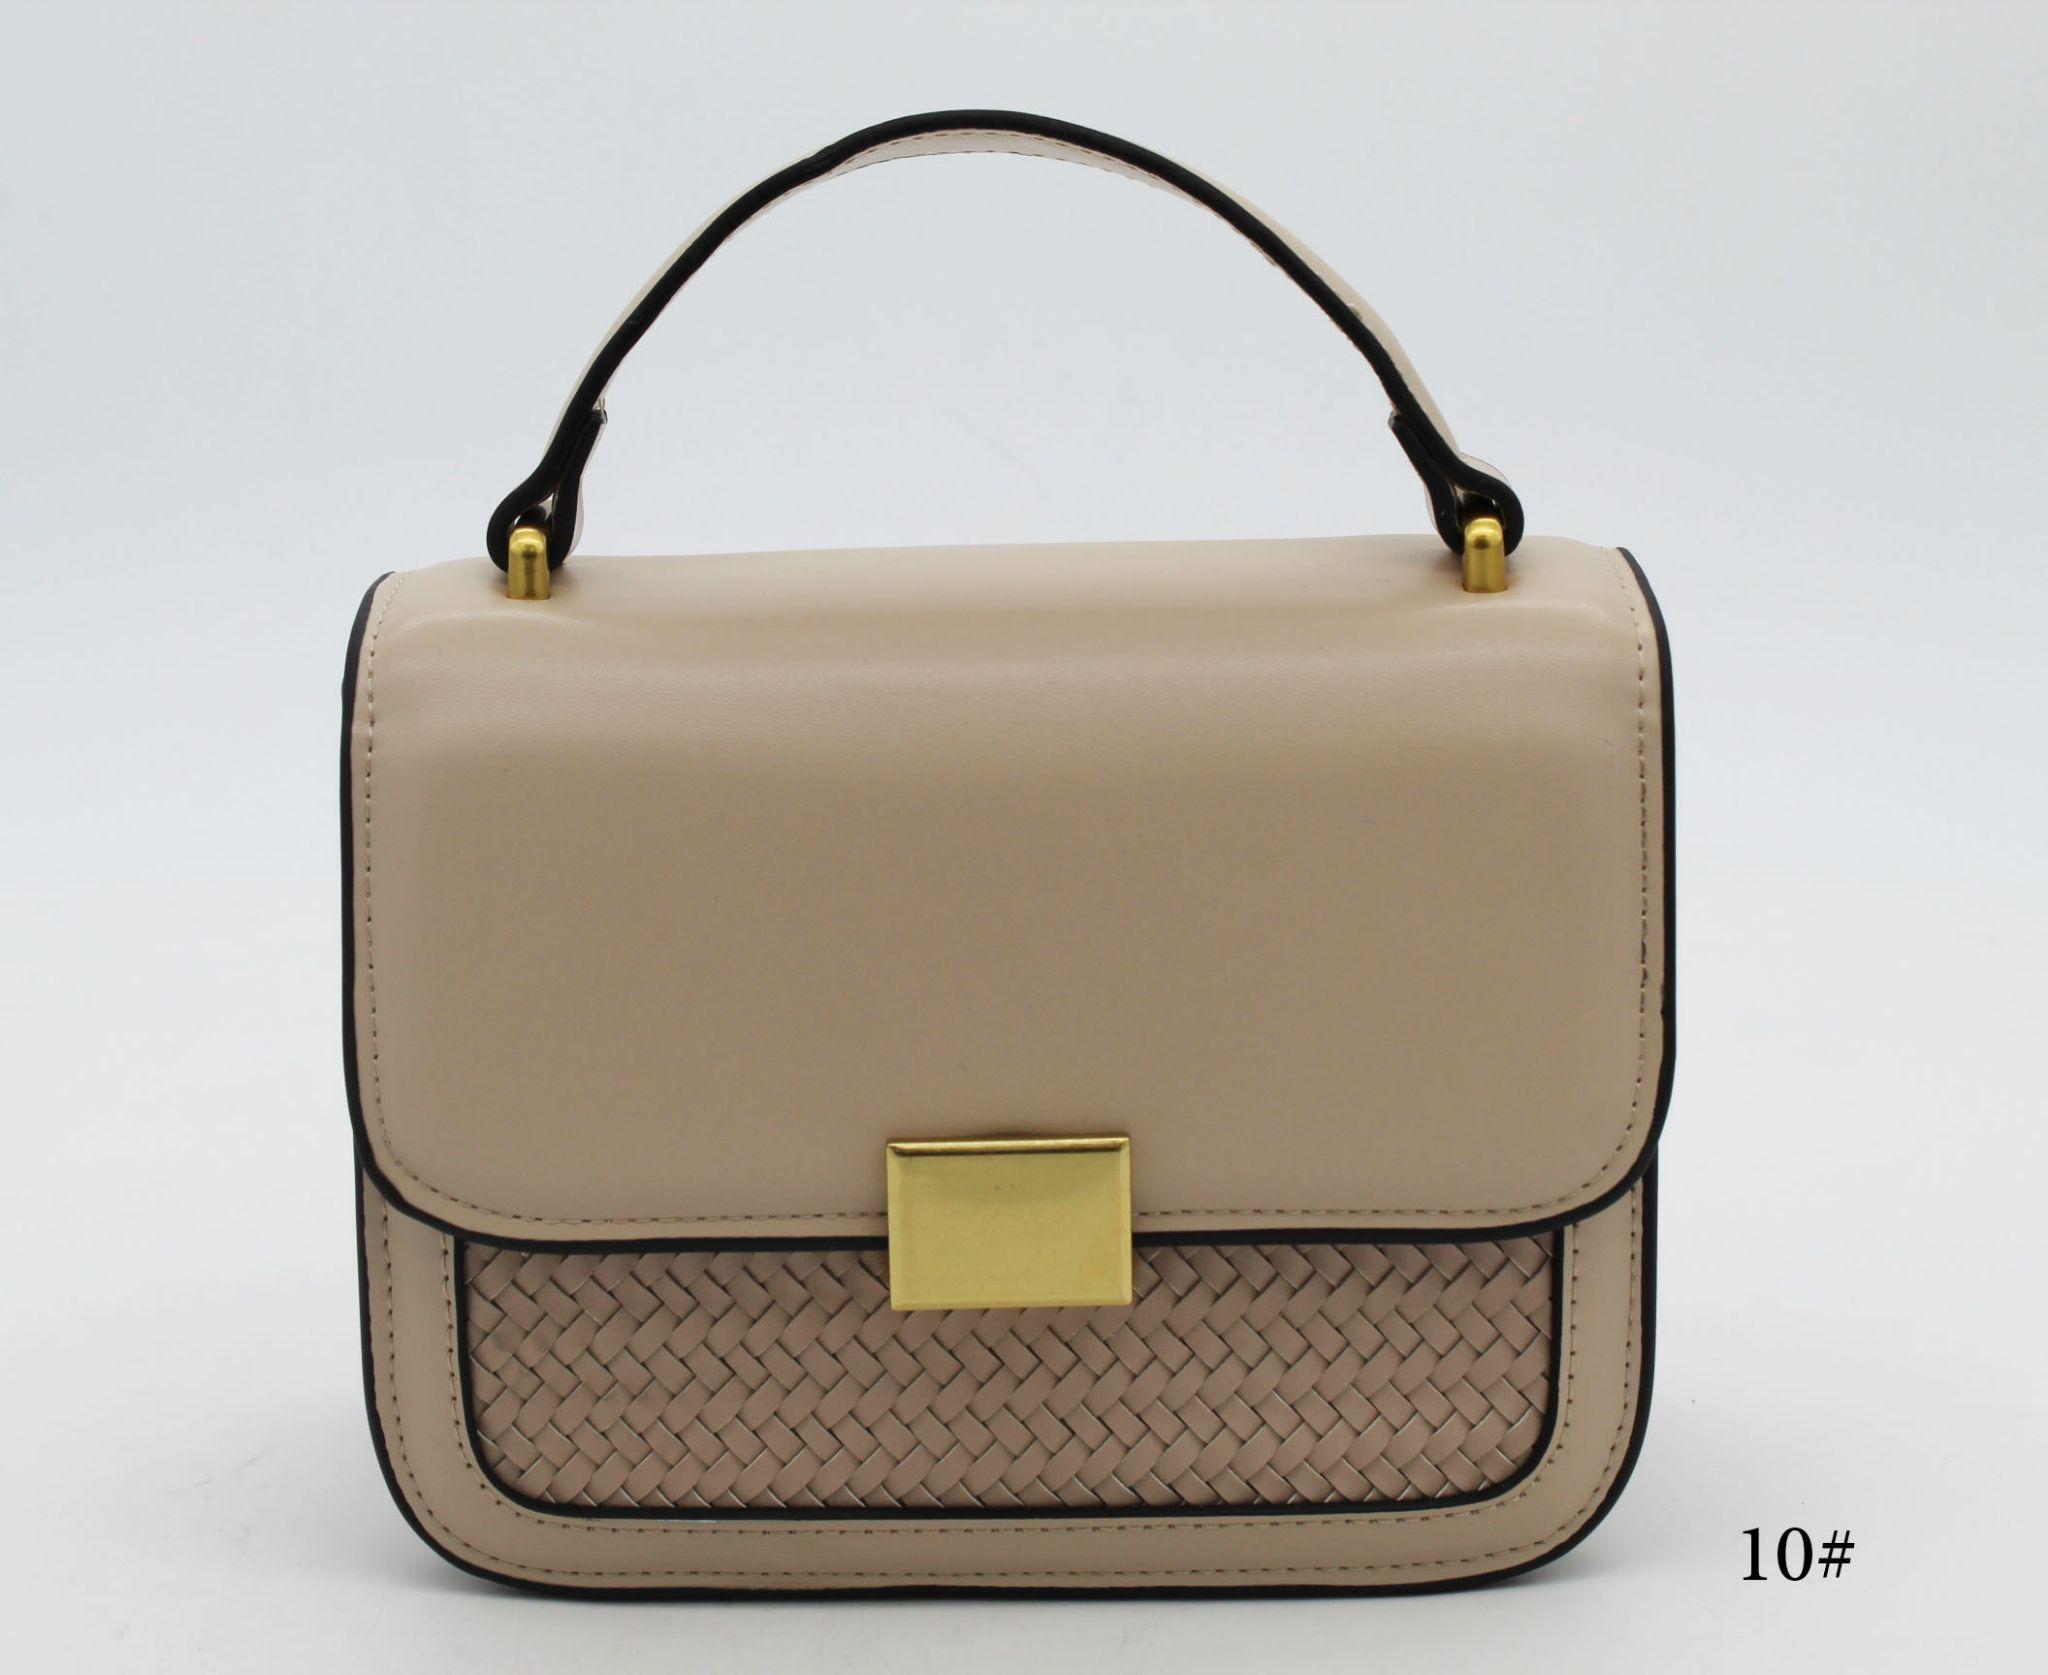 شنطة كارينو وسط كارينو Bags Kate Spade Crossbody Top Handle Bag